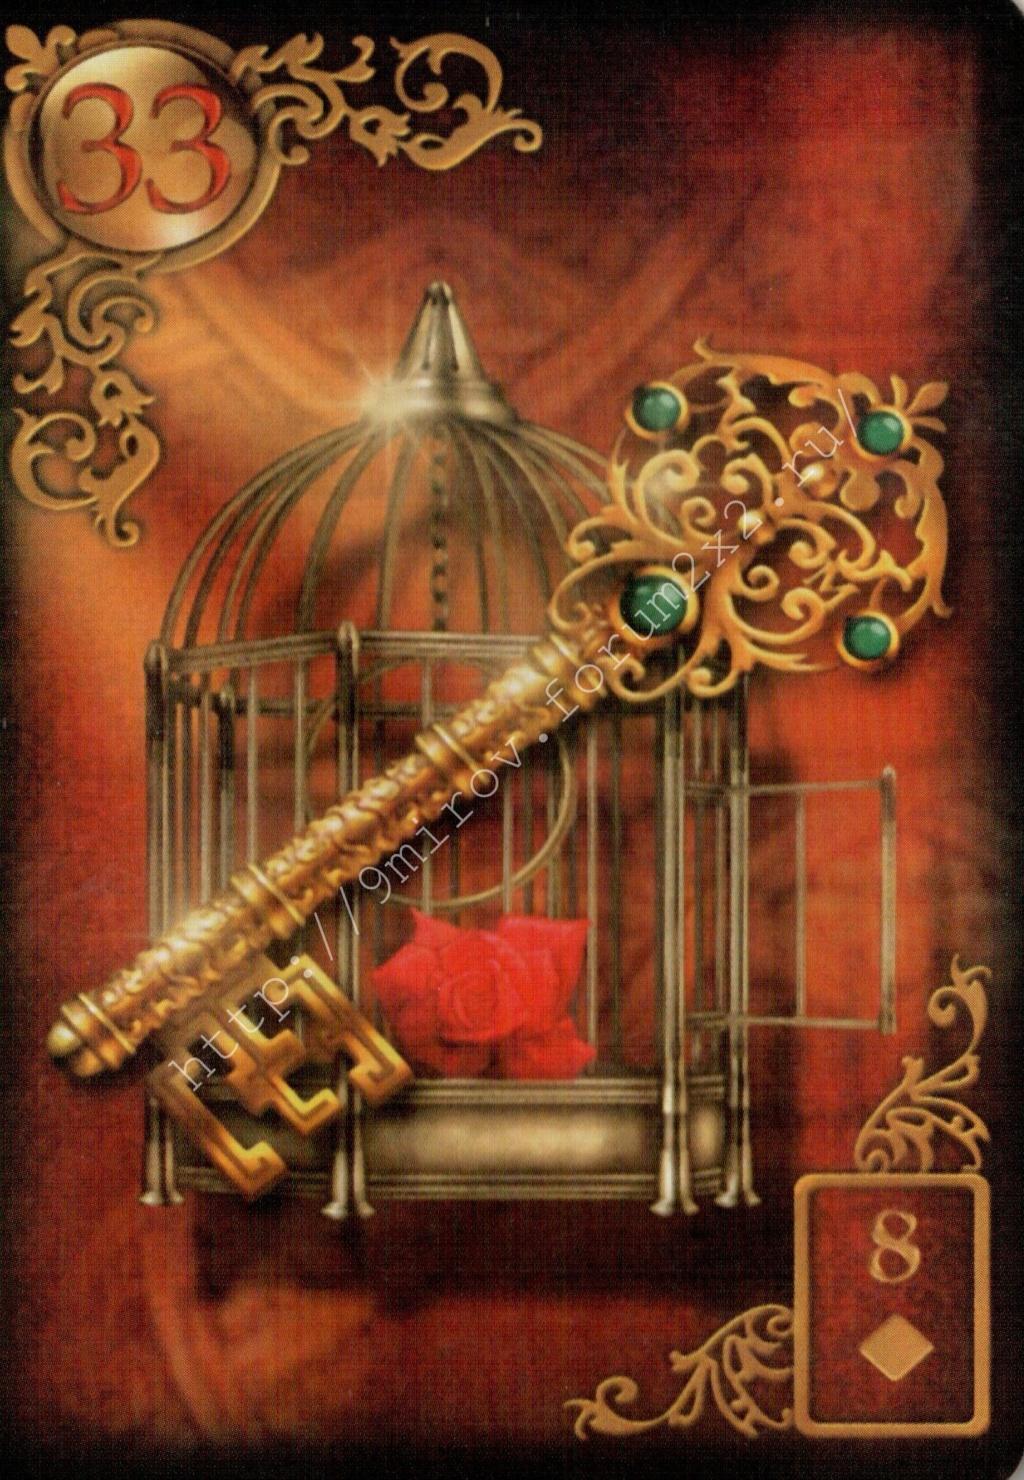 Золотые мечты Ленорман (Расширенное издание) | Gilded Reverie Lenormand. Галерея.  Water125